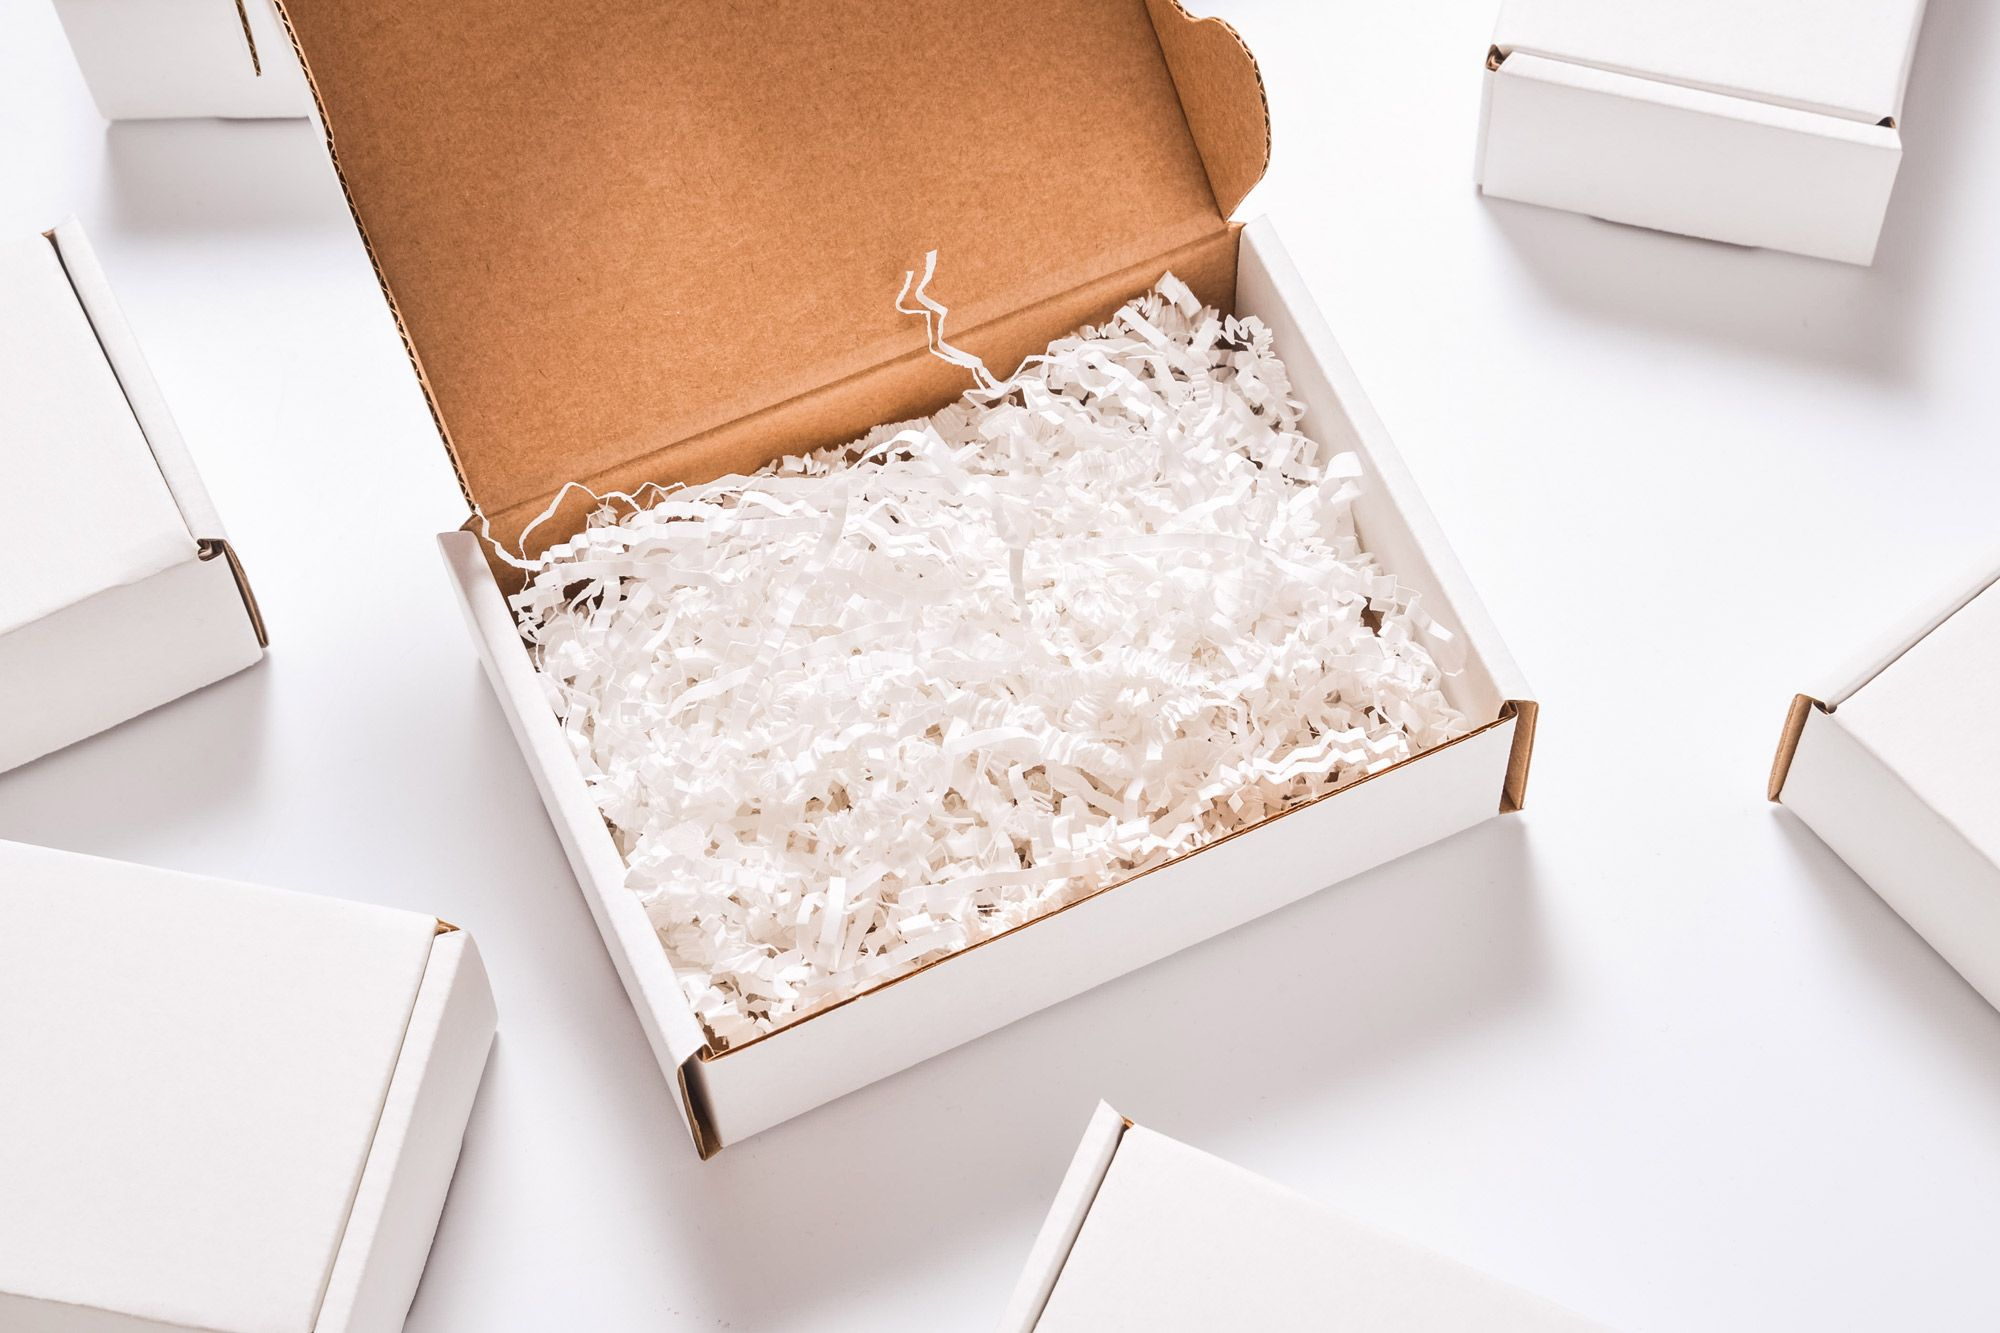 Shredded paper shipping supply